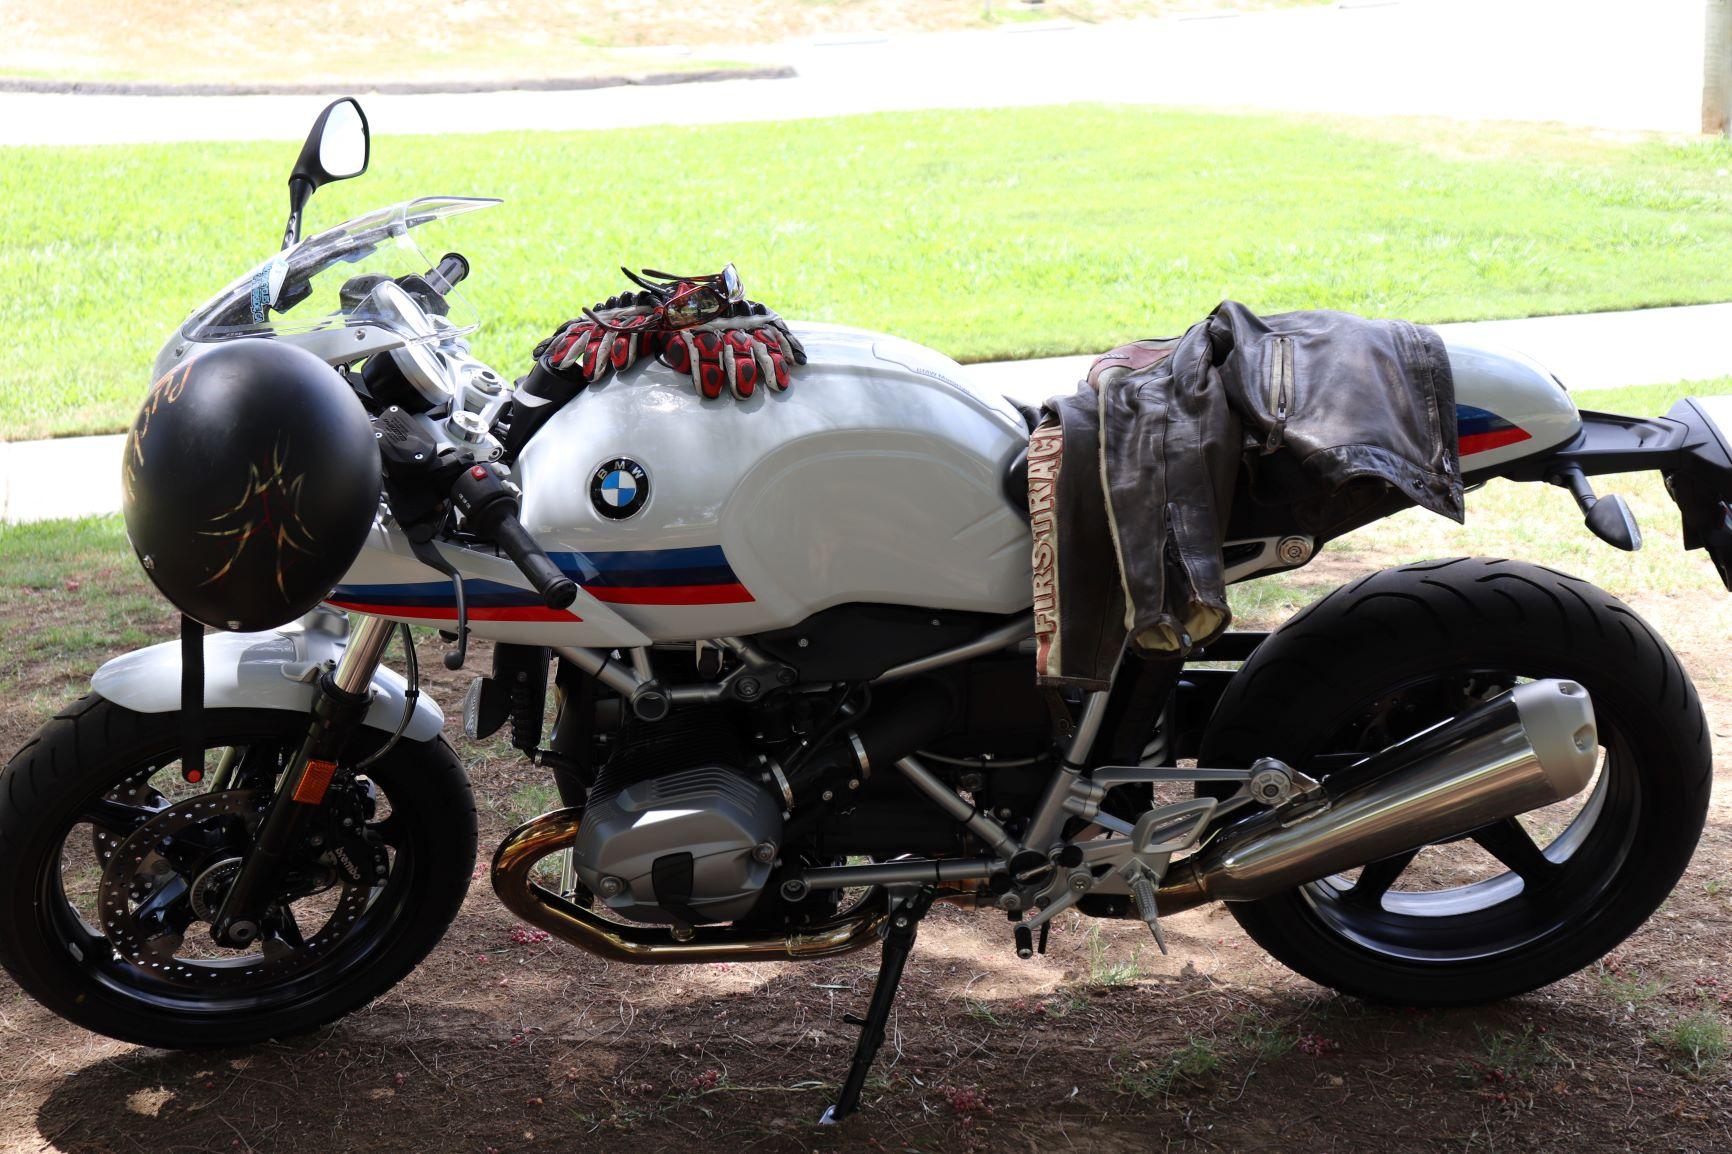 r9t, r nine t, bmw r nine t, rninet, bmw motorcycles, albes adv